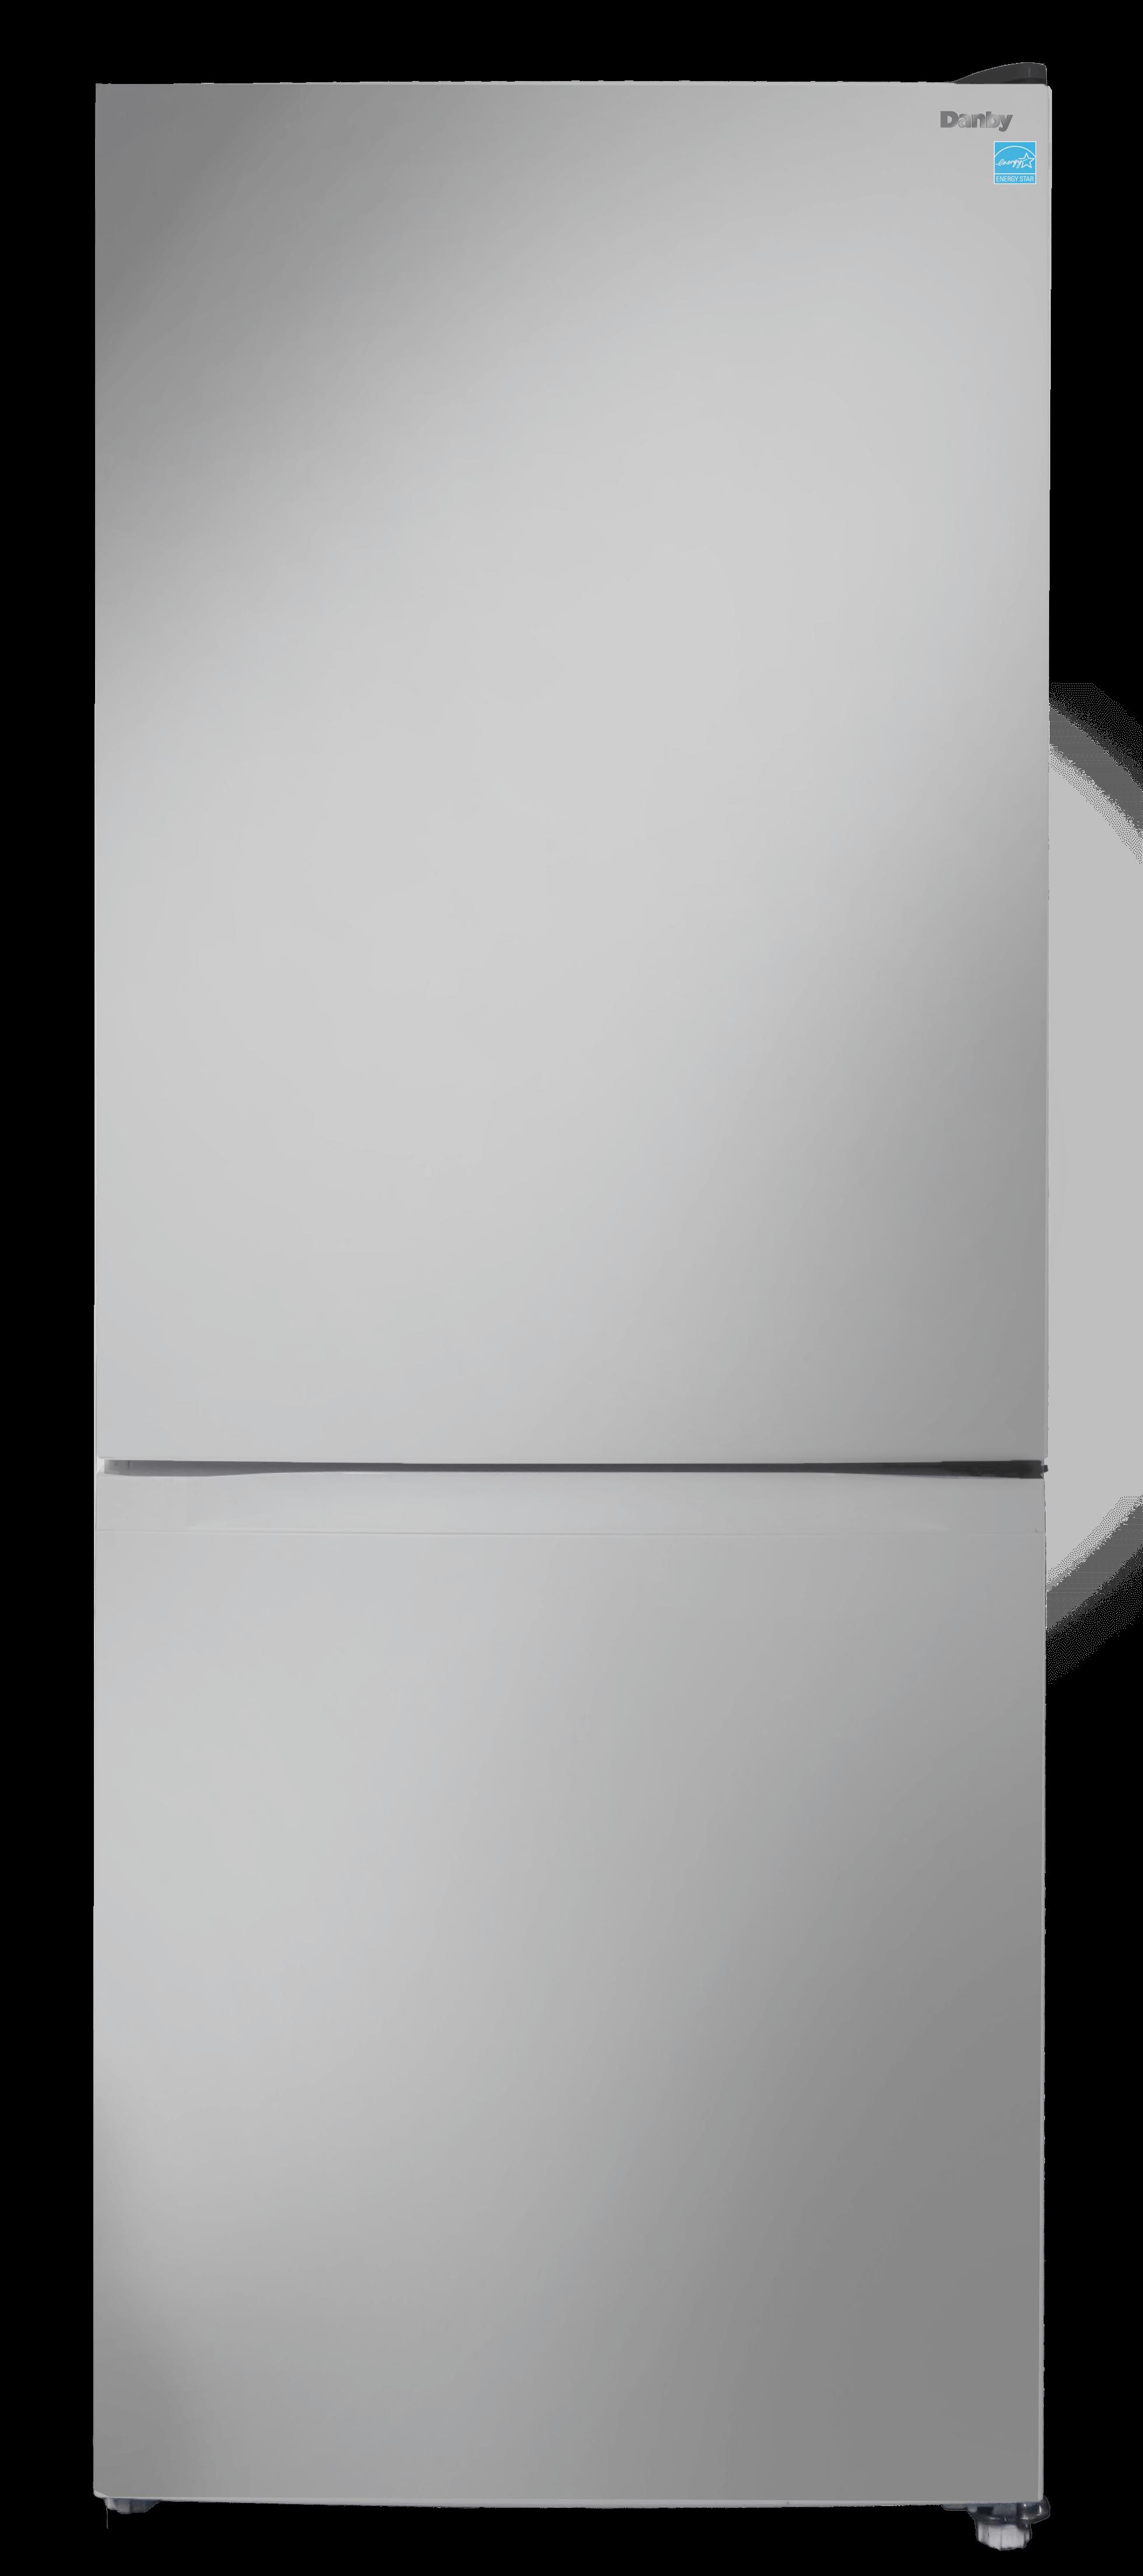 Danby 10 cu.ft Bottom Mount Refrigerator